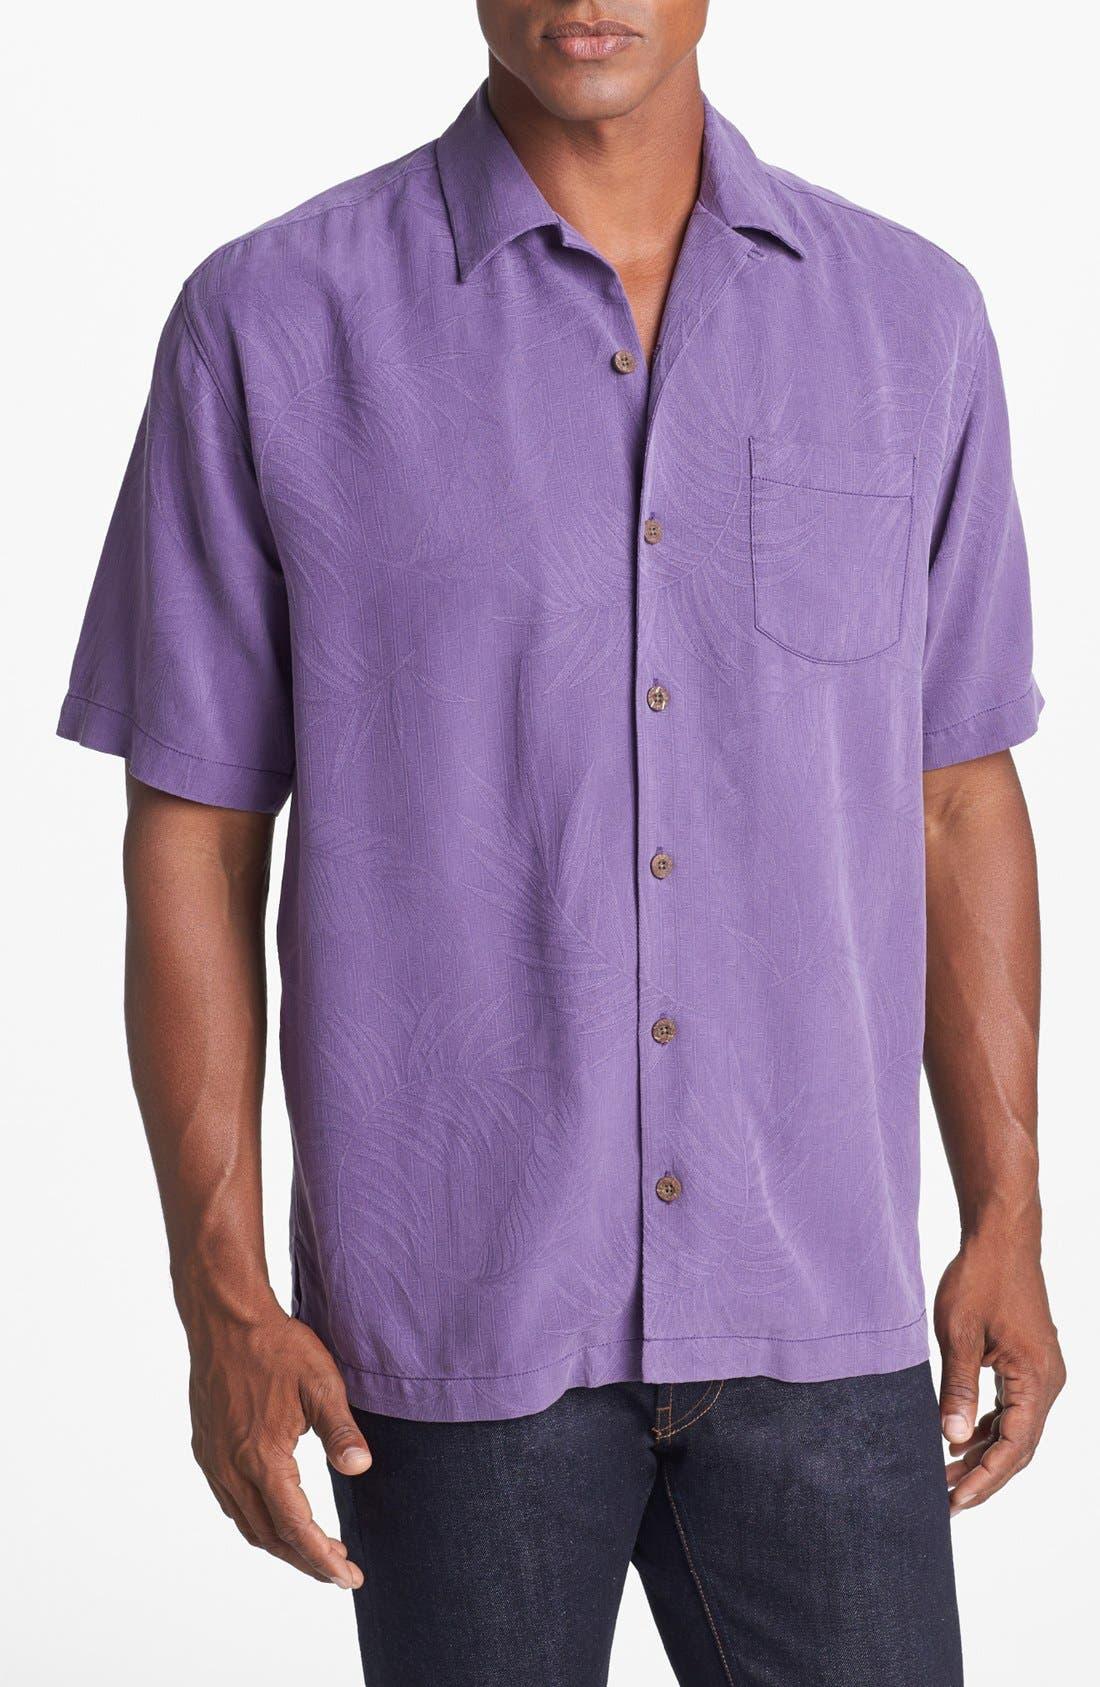 Alternate Image 1 Selected - Tommy Bahama 'Tiki Palms' Original Fit Sport Shirt